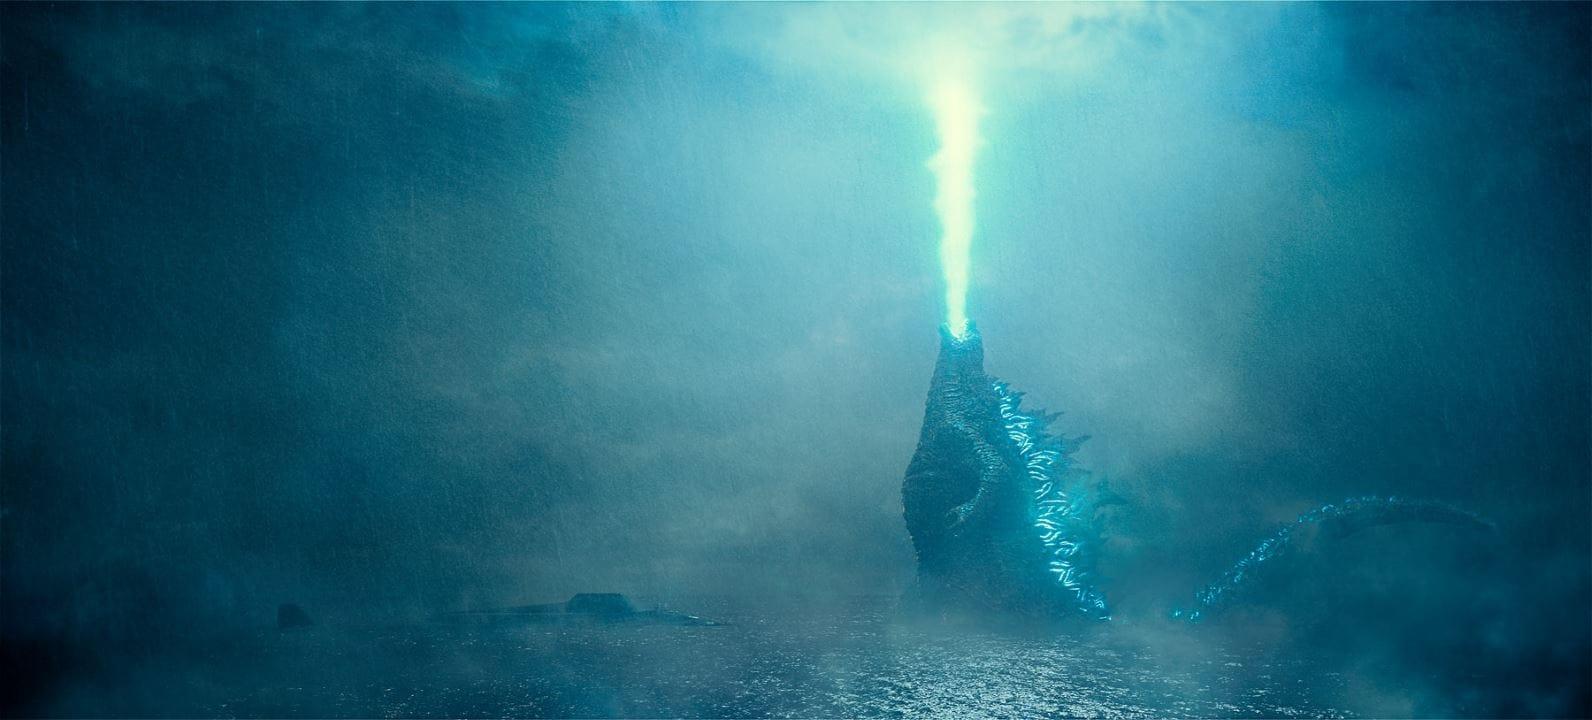 Godzilla: King of the Monsters Trailer – a Kaiju Fest With Mothra, Rodan, and King Ghidorah